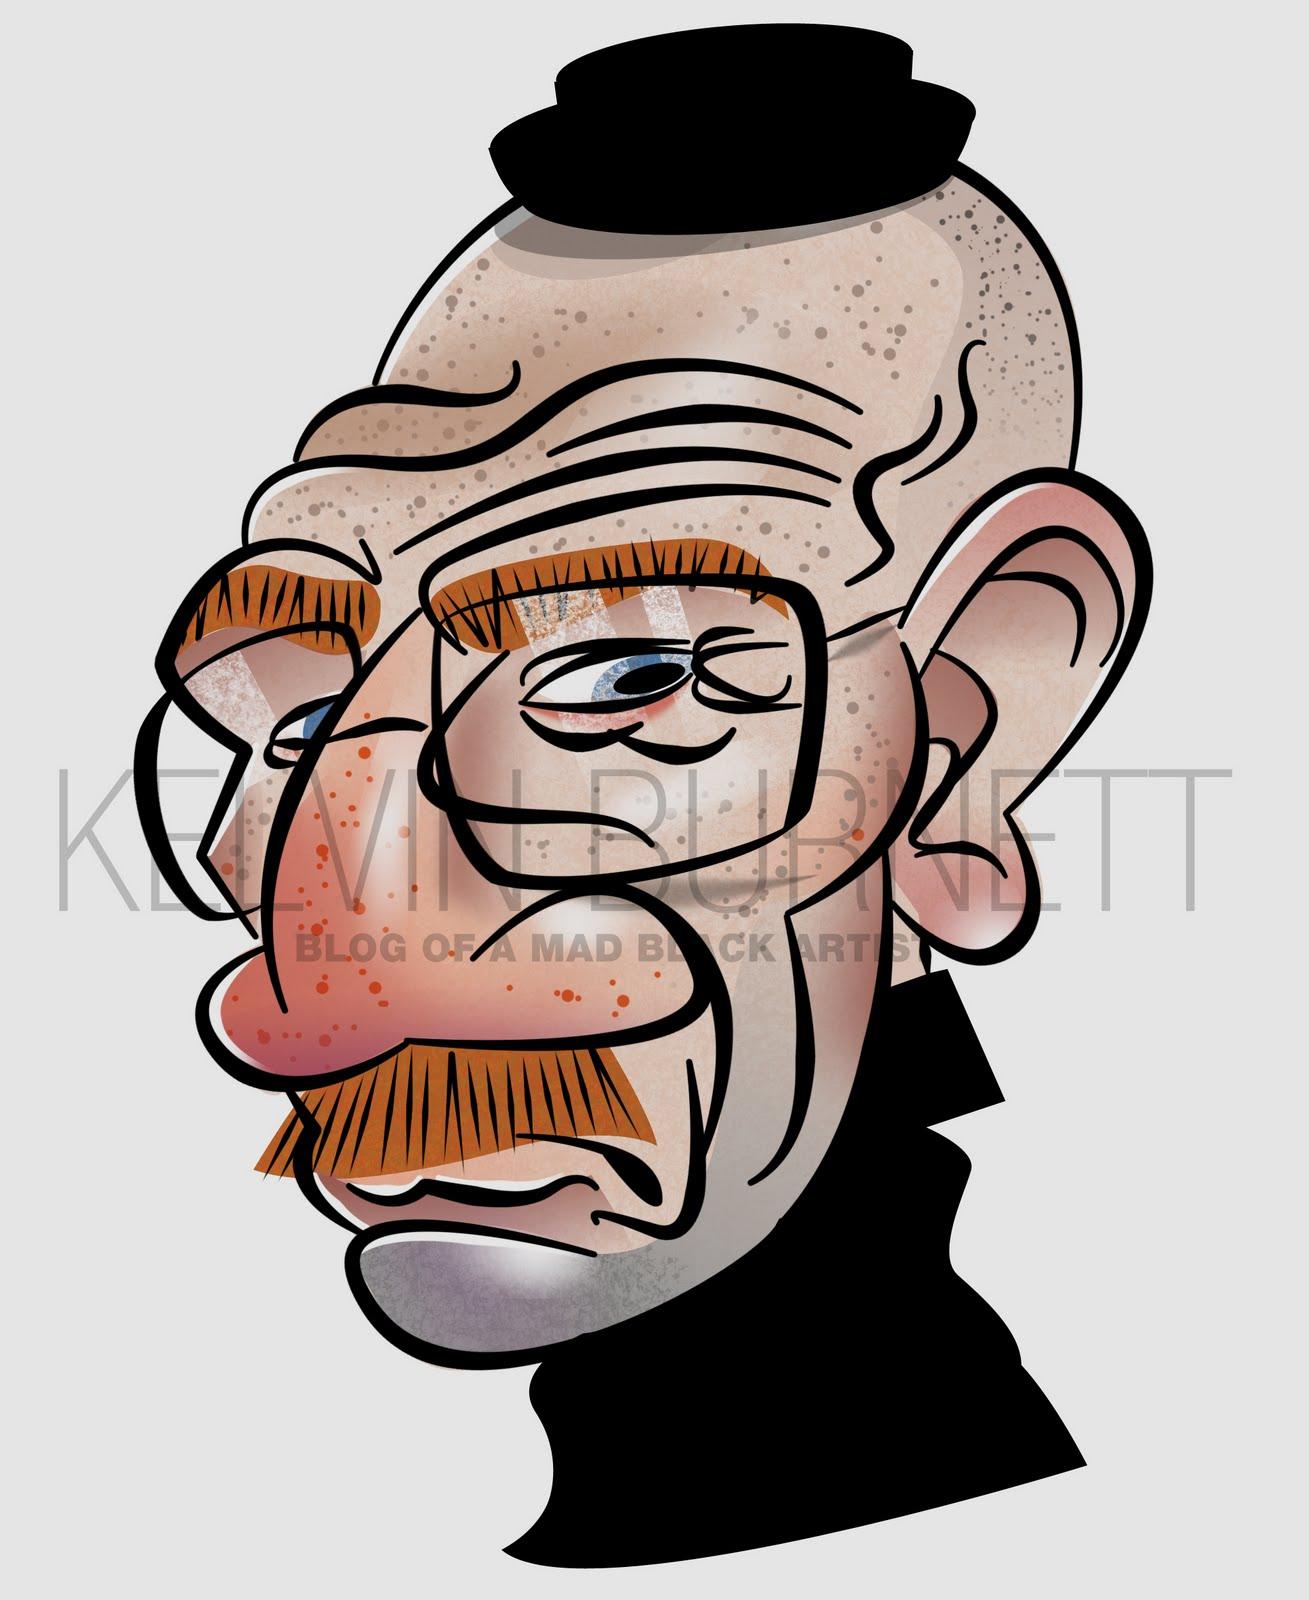 ... Breaking Bad: The Animated Series - Hector Salamanca. bwin wetten stornieren bwin Live-Ergebnisse Fußball Heisenberg on